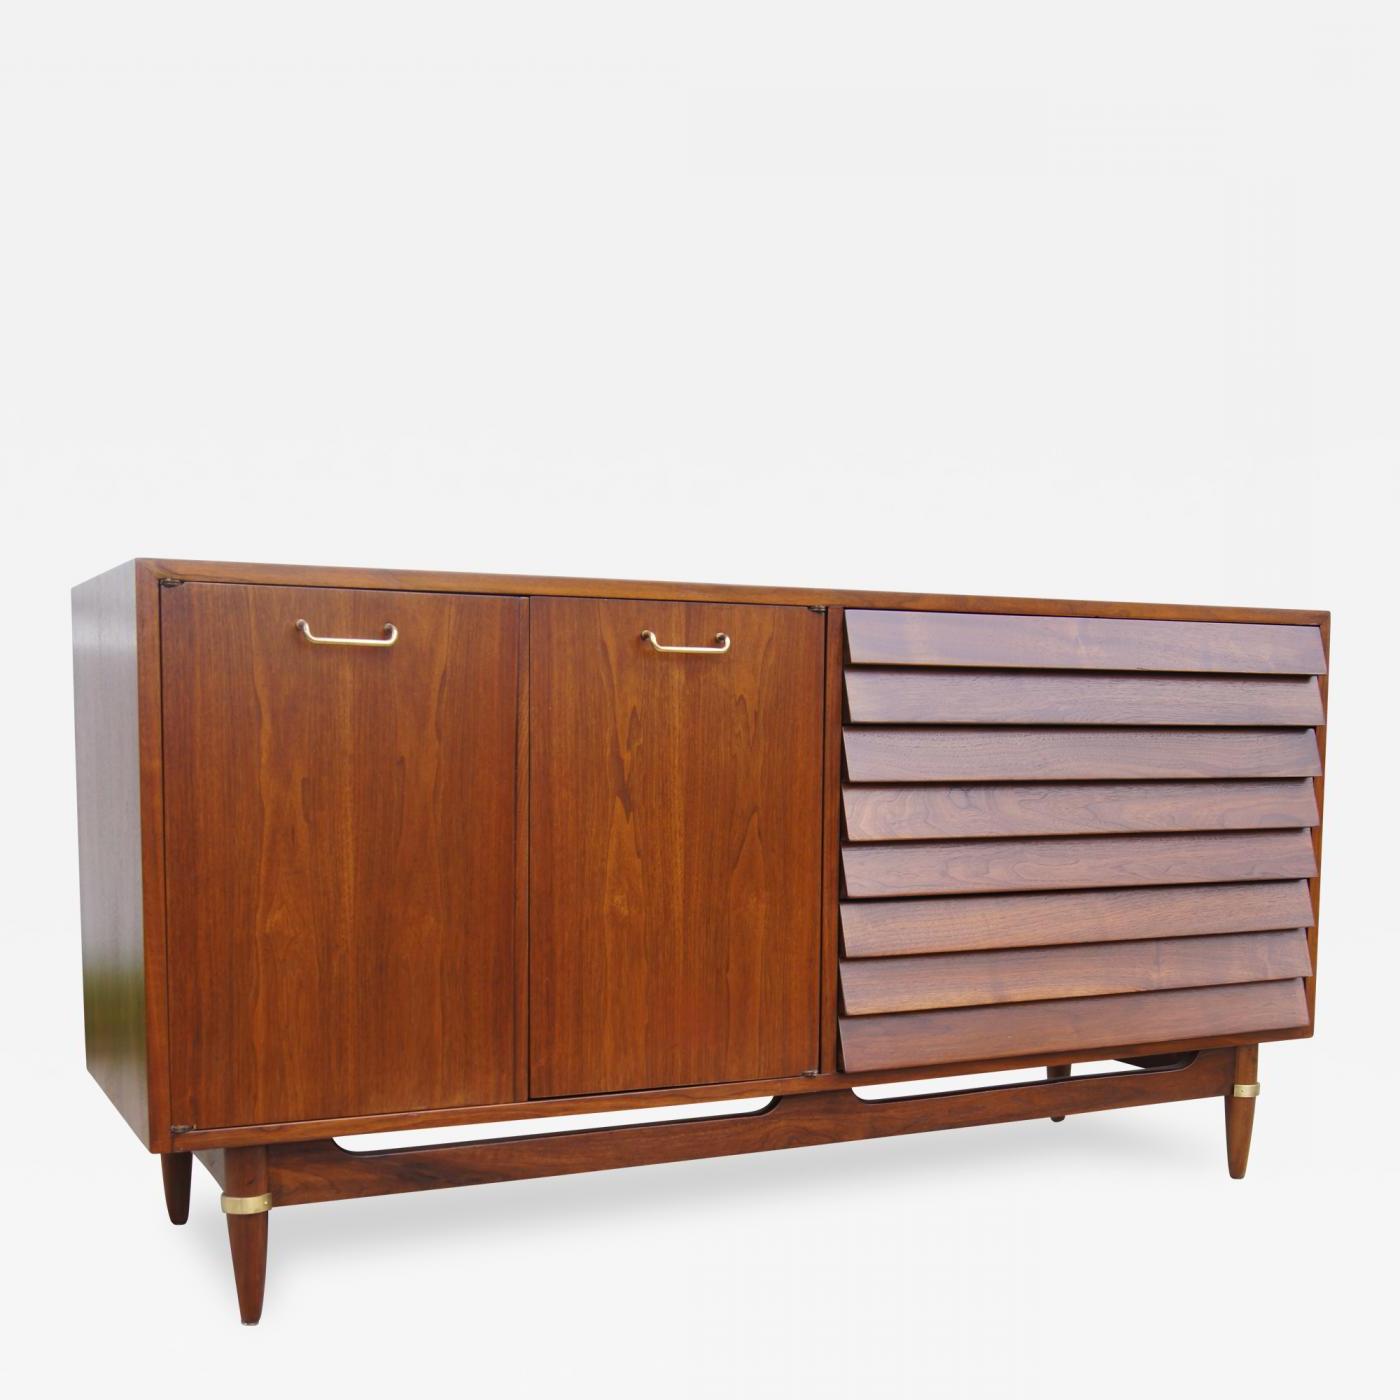 Favorite Merton Gershun – Sideboardmerton Gershun For American Of For Aged Brass Sideboards (View 20 of 20)